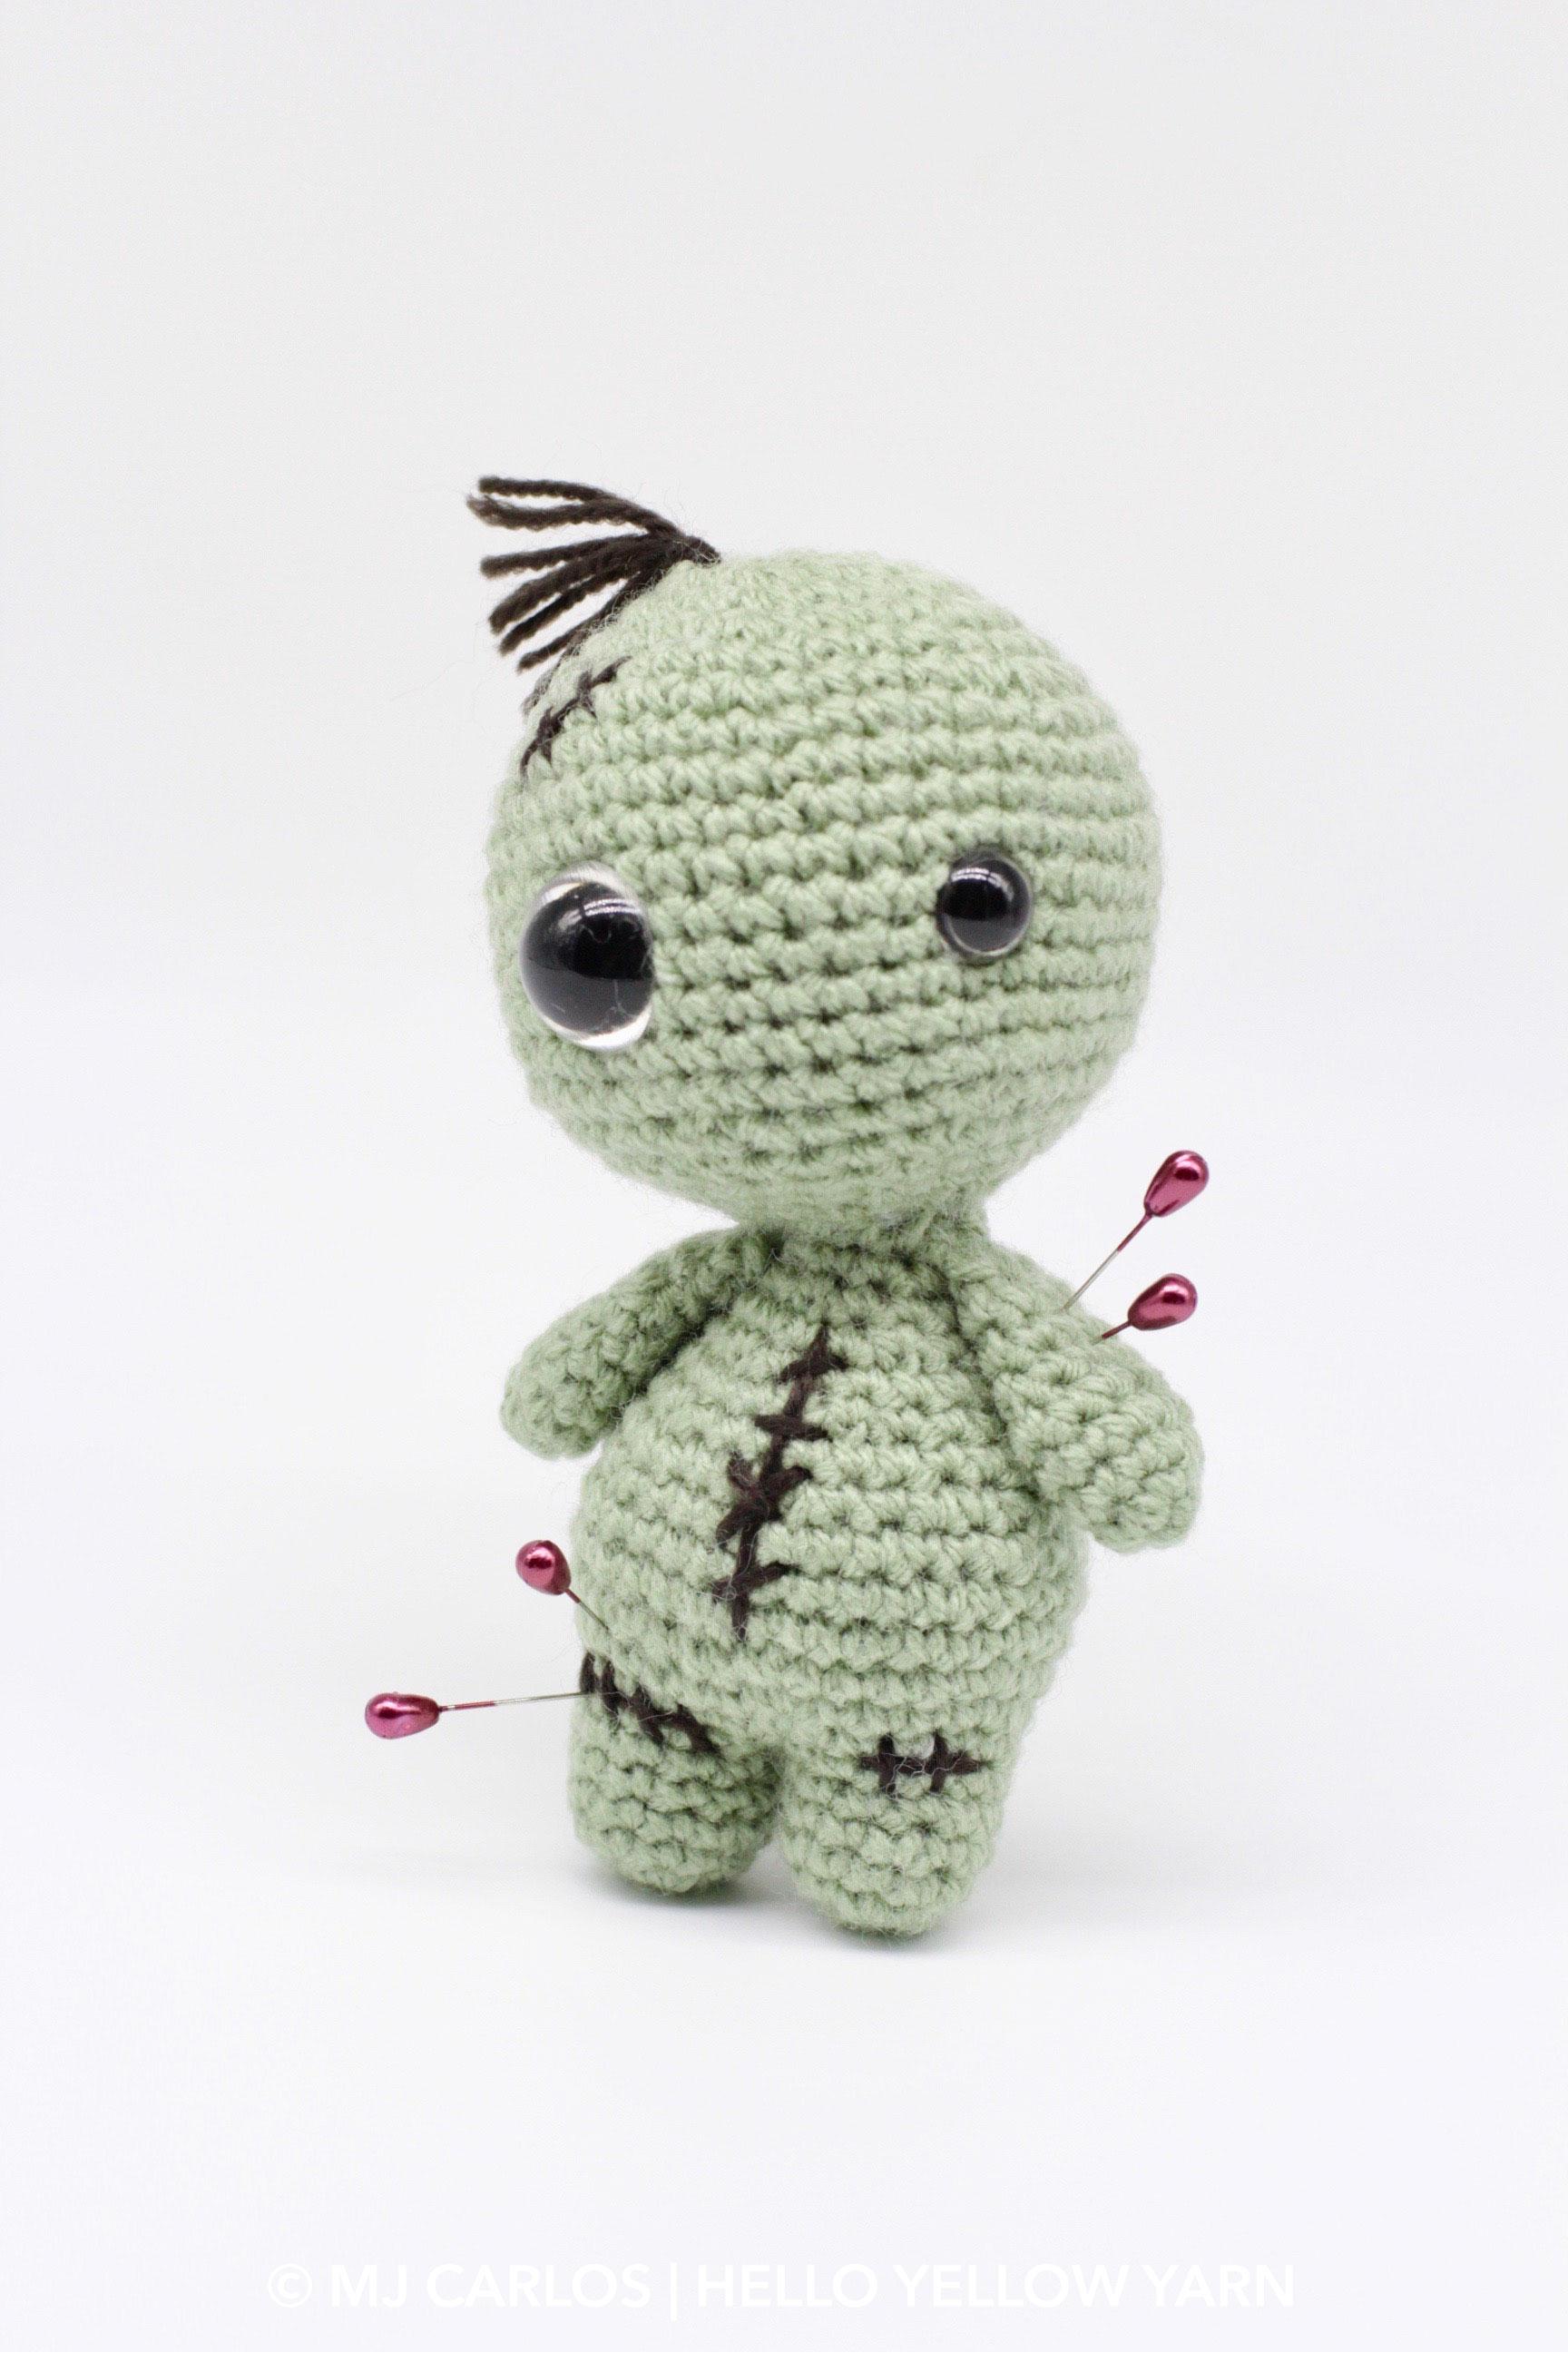 Mu\u00f1eco voodoo Poppet Doll Crochet amigurumi toy Crochet toy Pincushion Zombie Doll Vodou Doll Voodoo doll Stuffed toy